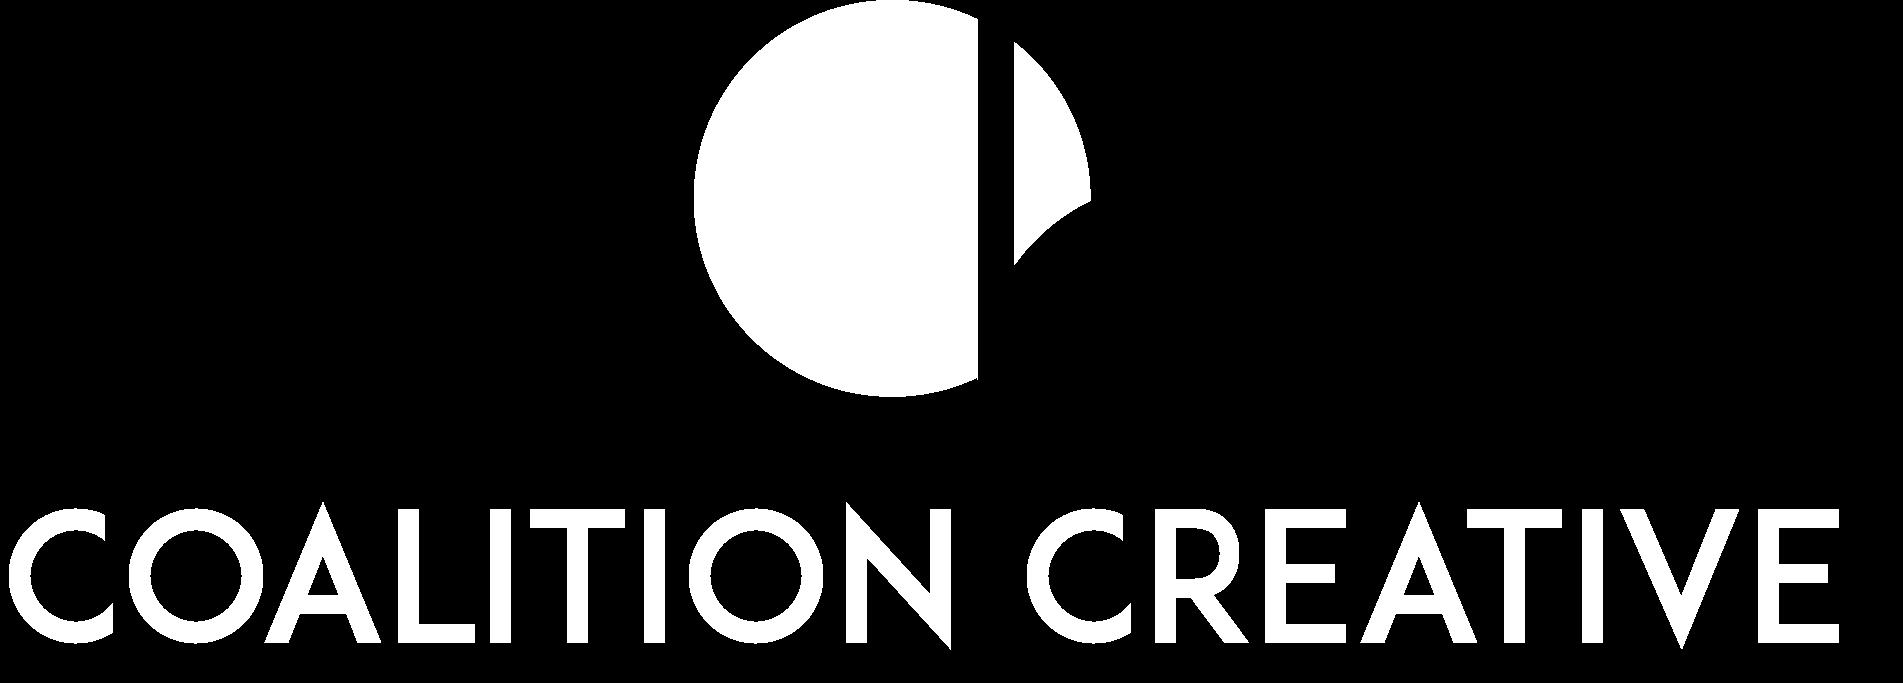 coalition-creative1-white